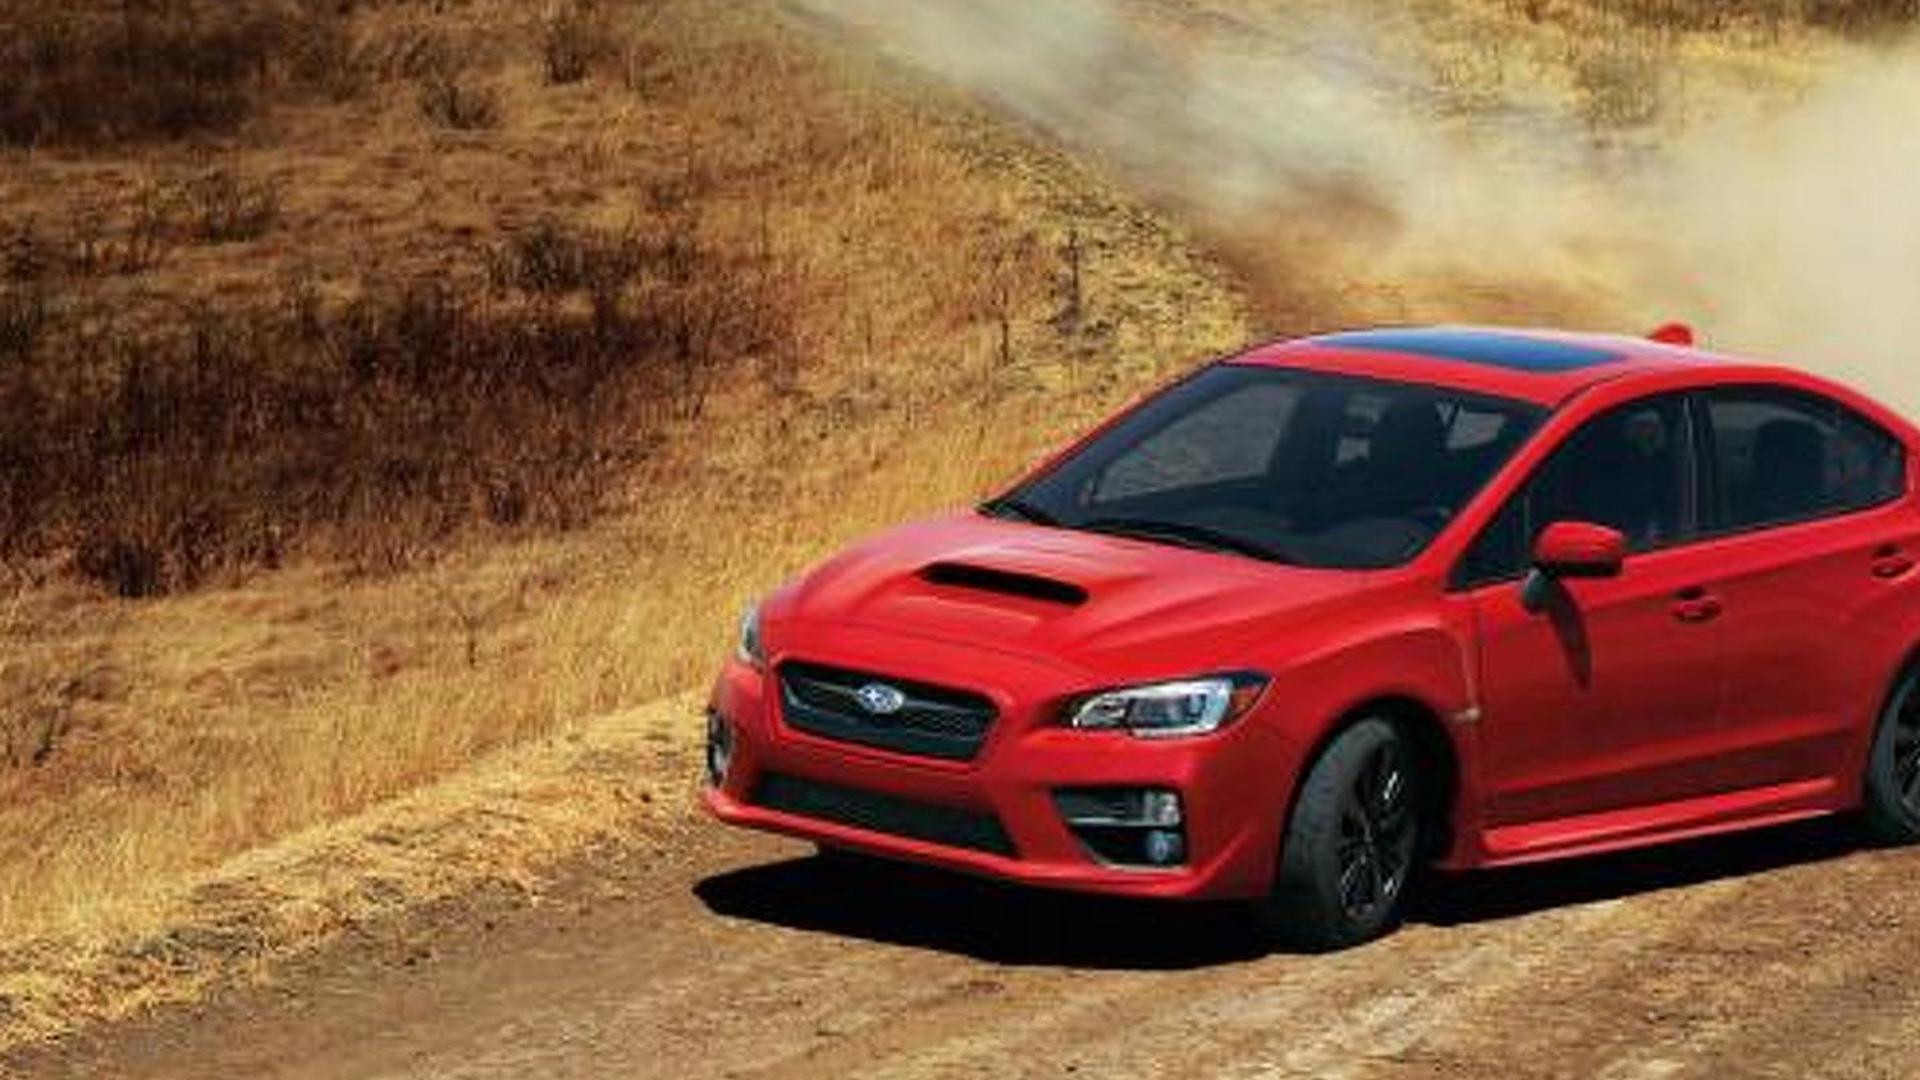 2015 Subaru WRX and WRX STI pricing announced